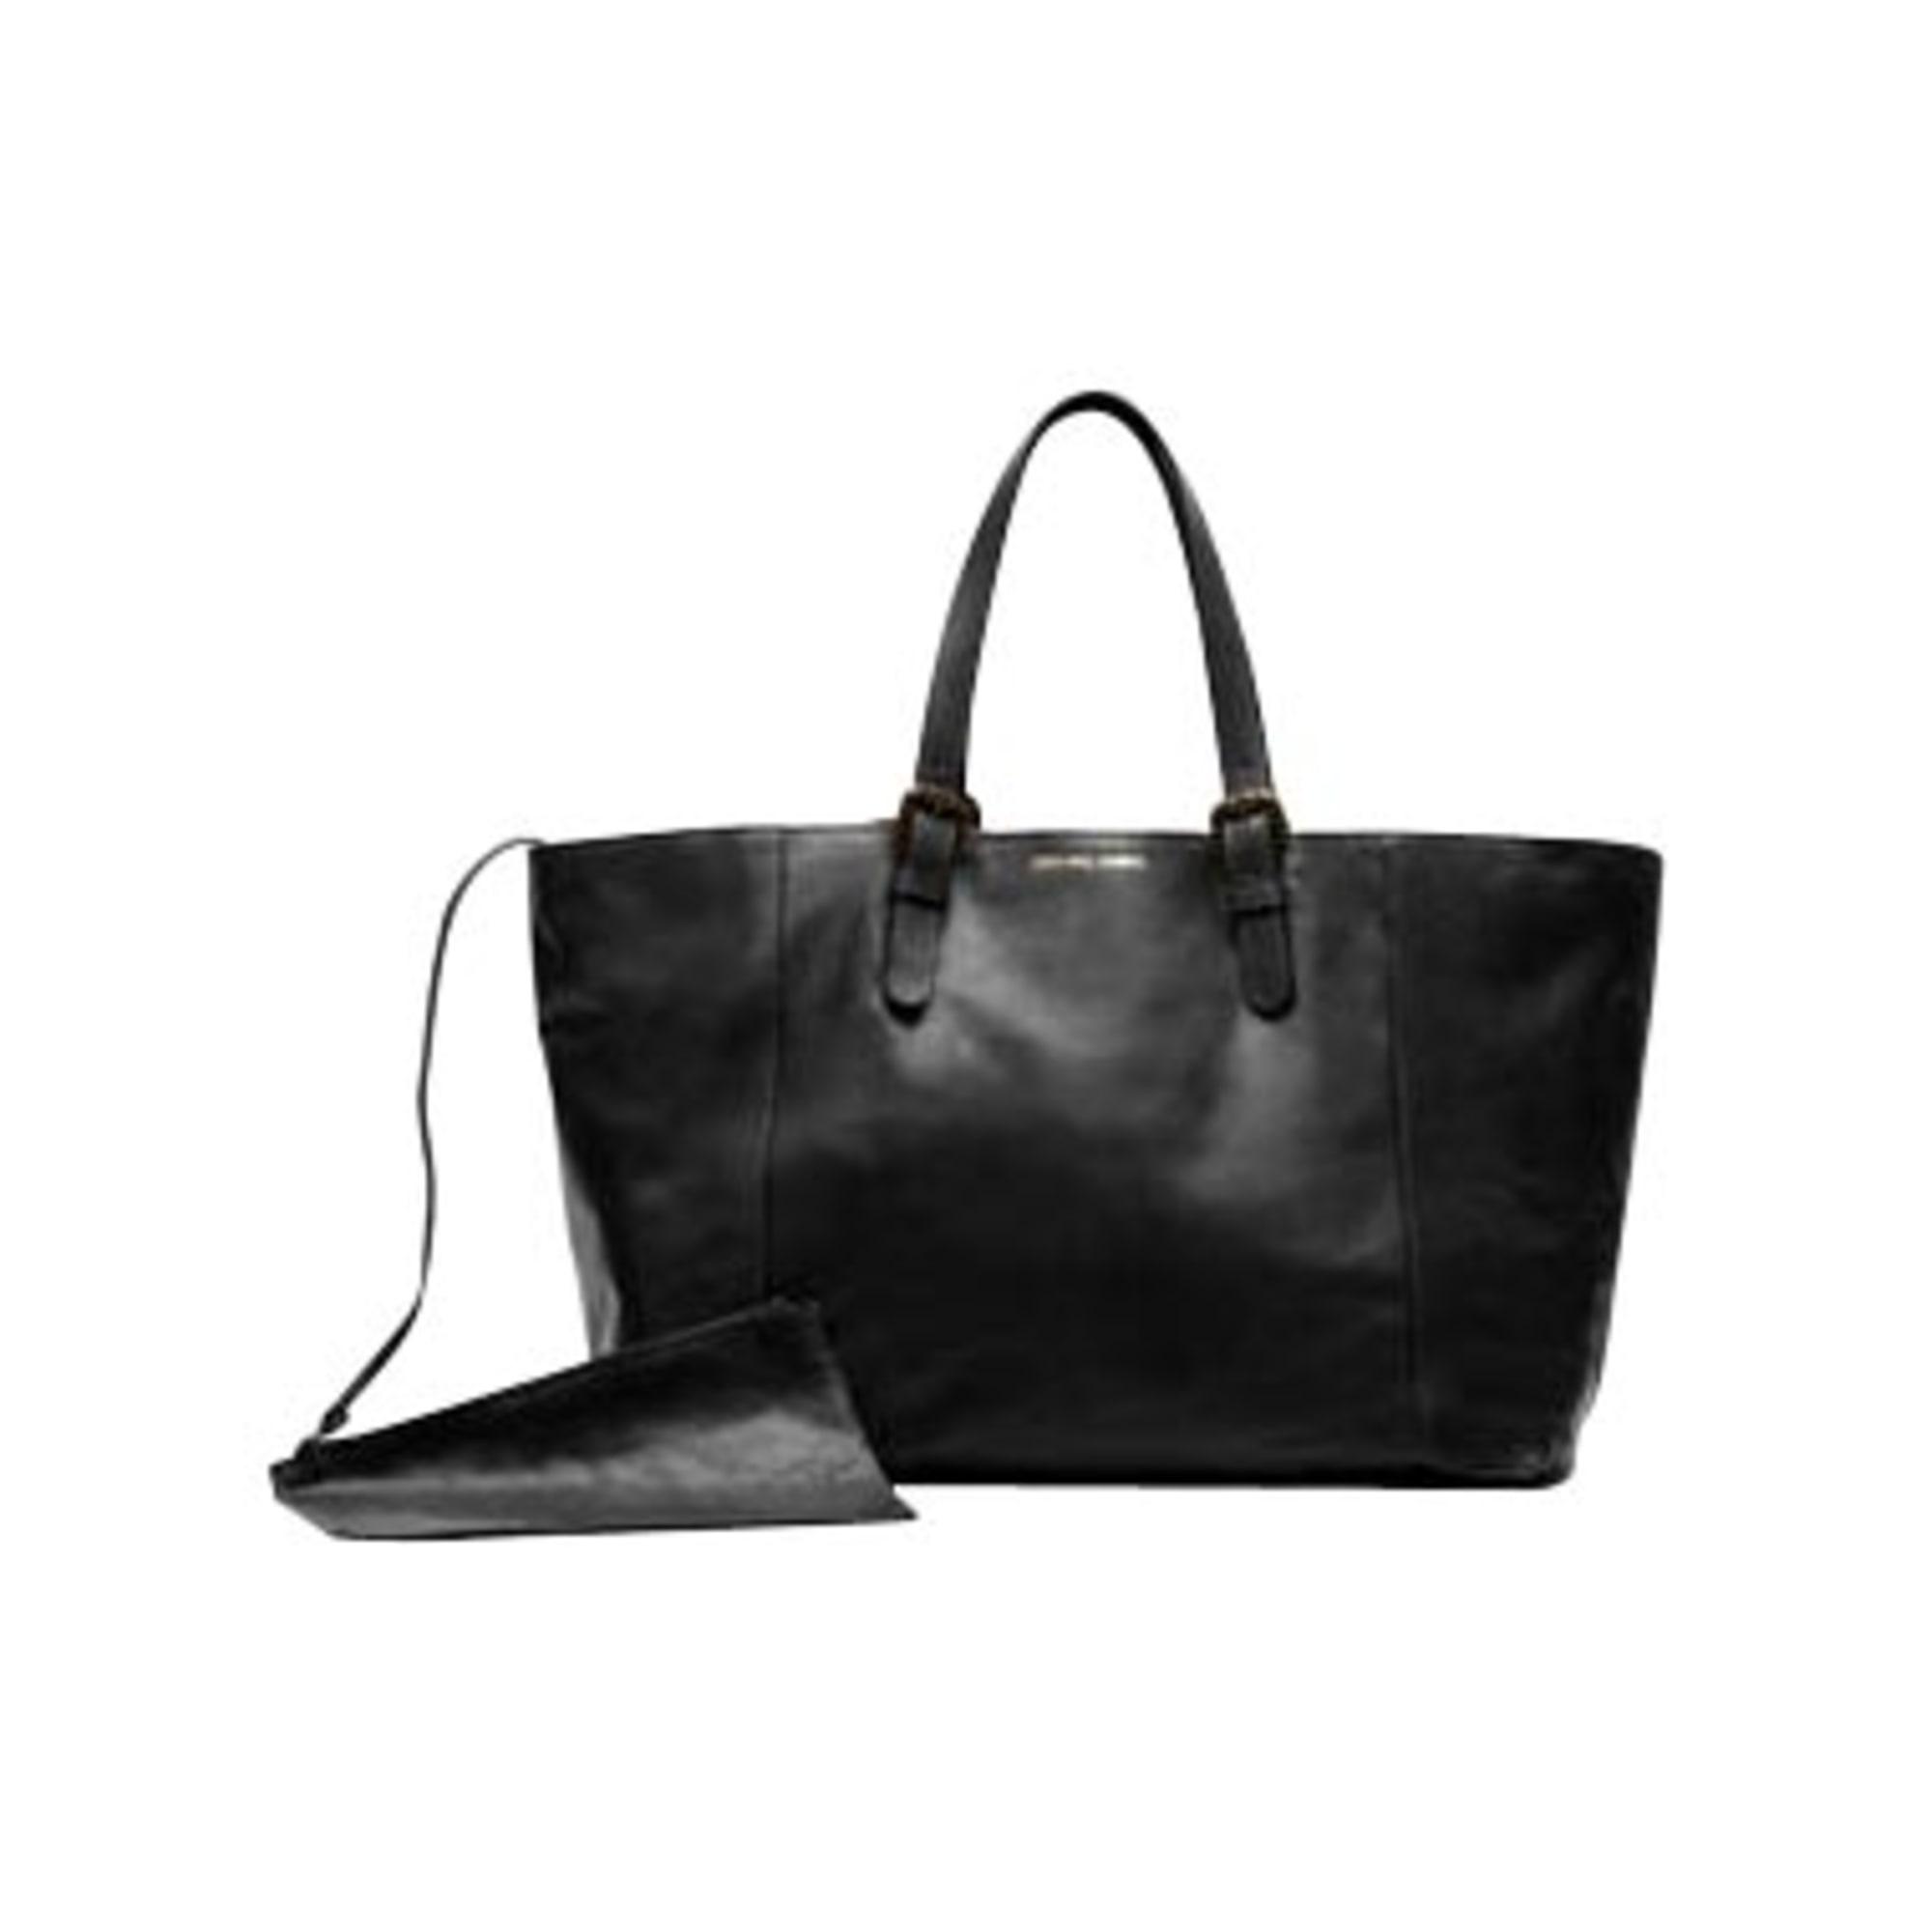 49e05acd4b Sac XL en cuir GERARD DAREL noir vendu par Valérie 562561023 - 3279204